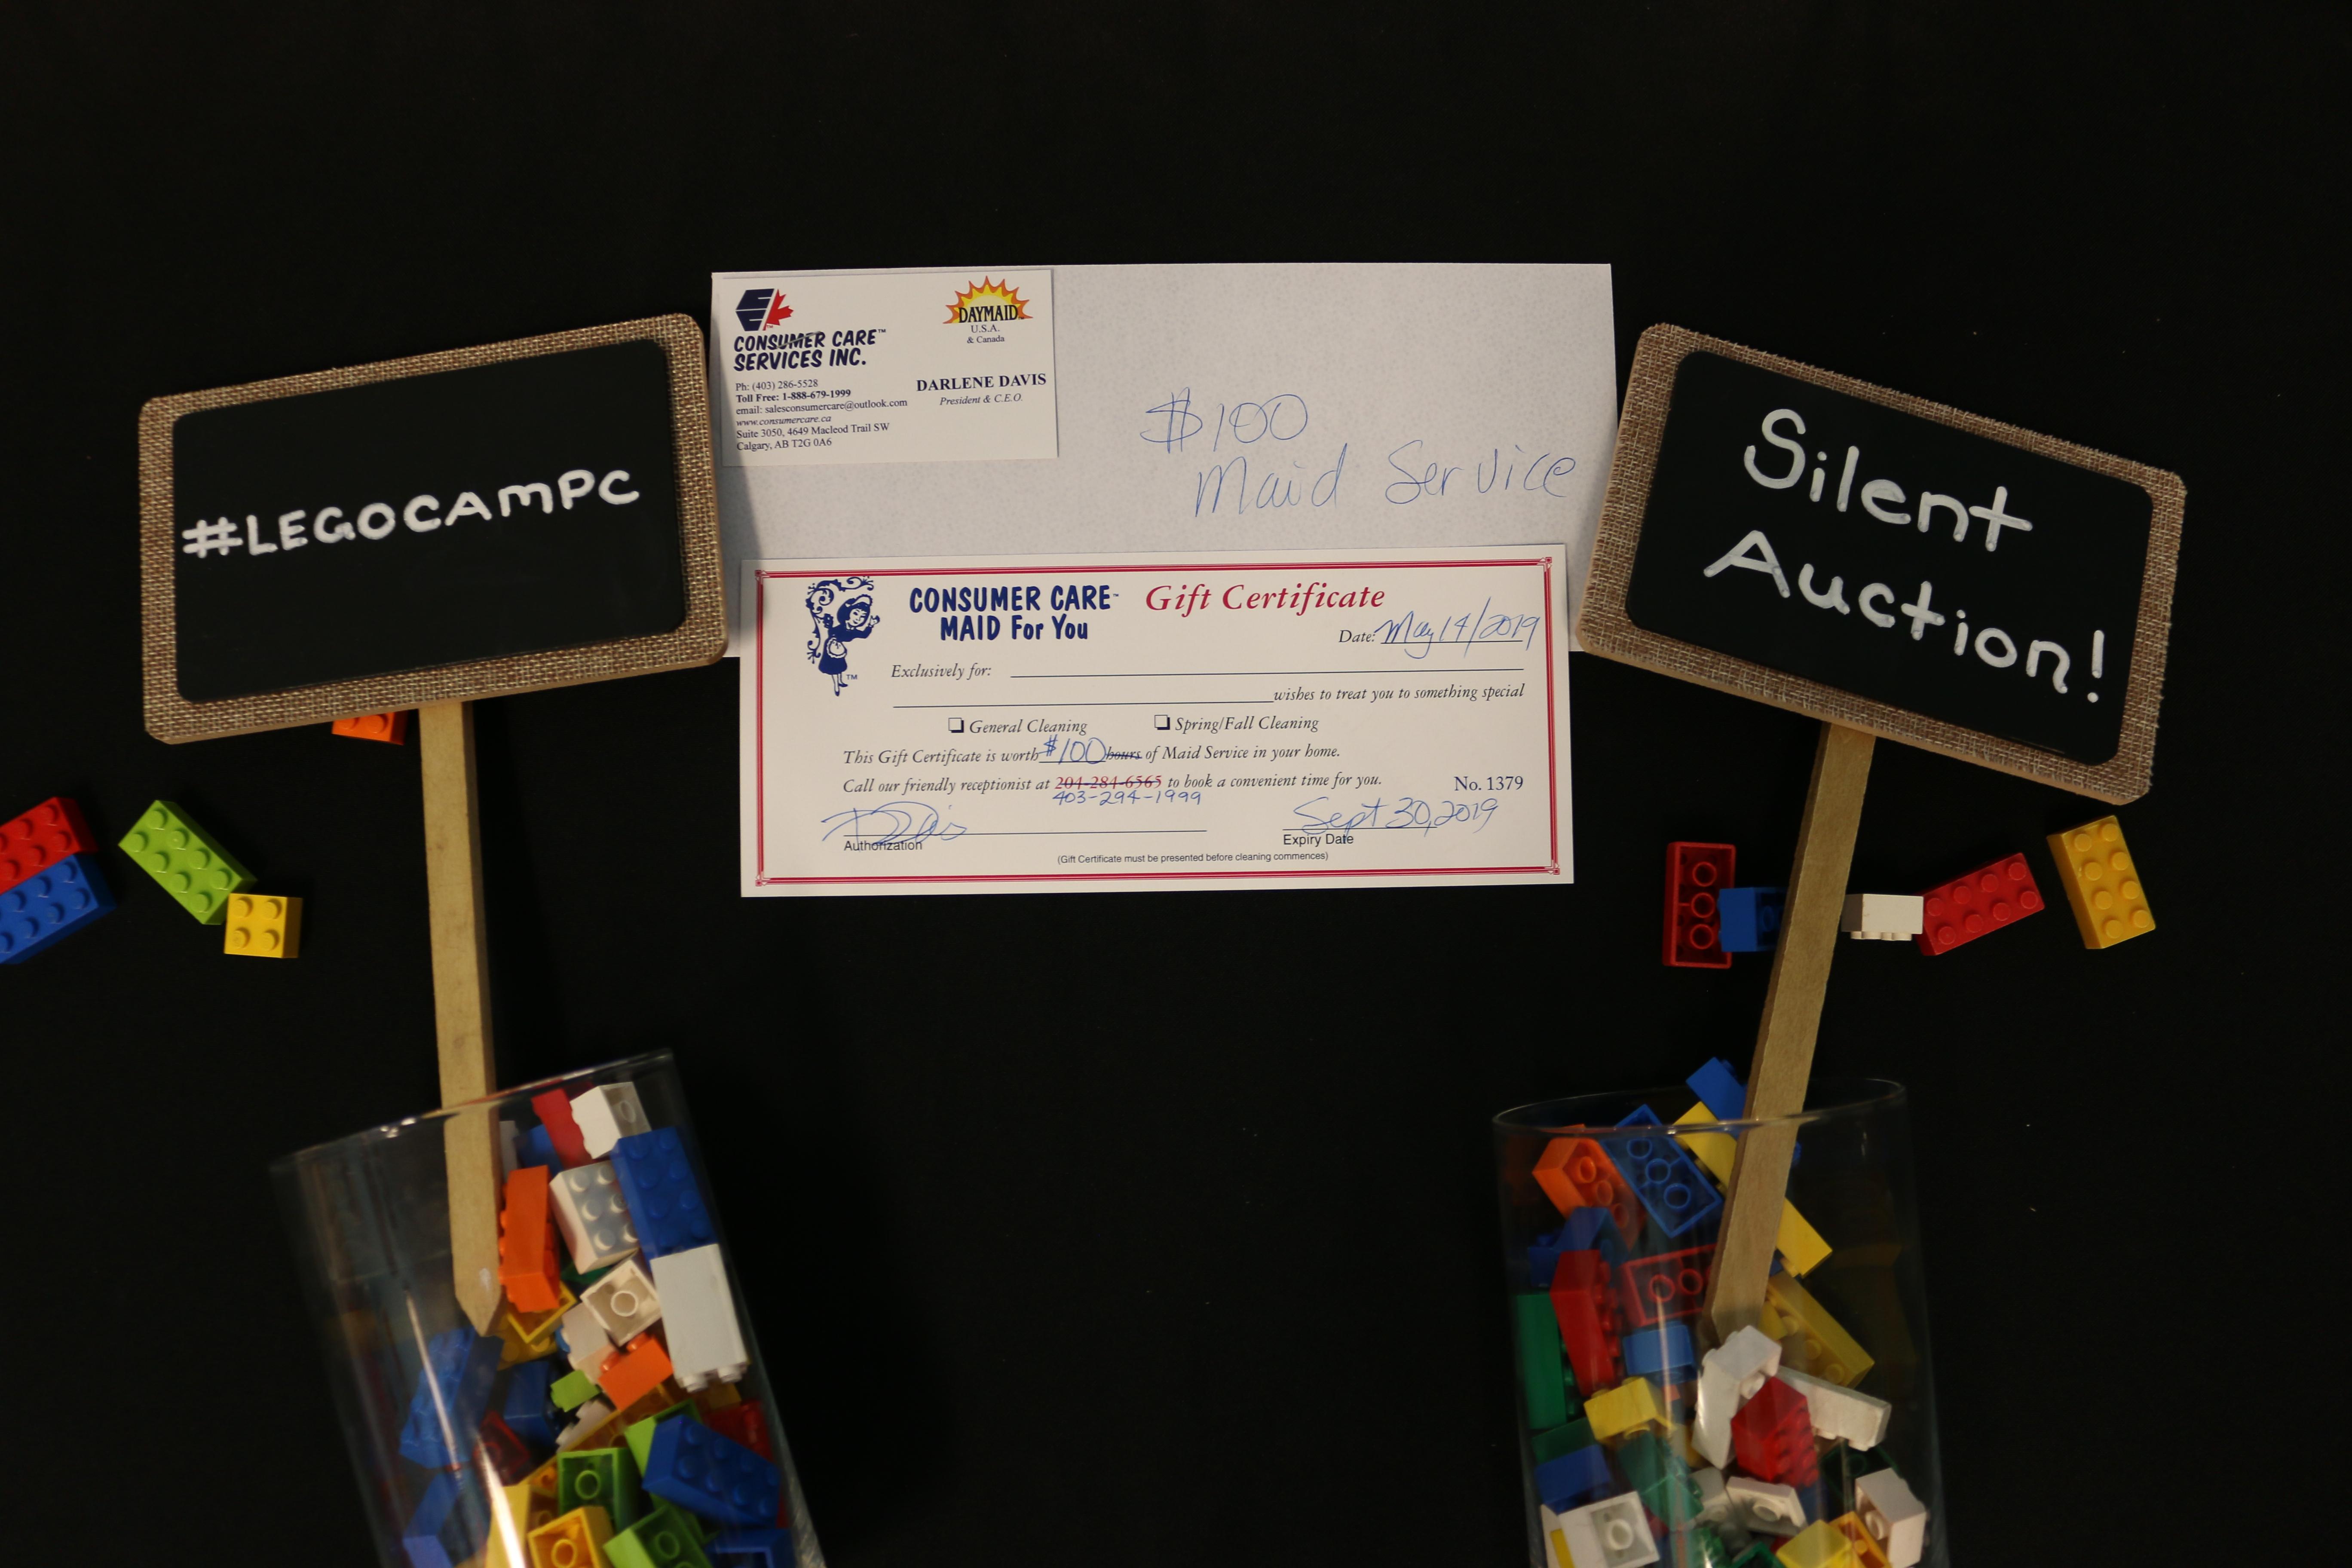 Consumer Care $100 Gift Certificate